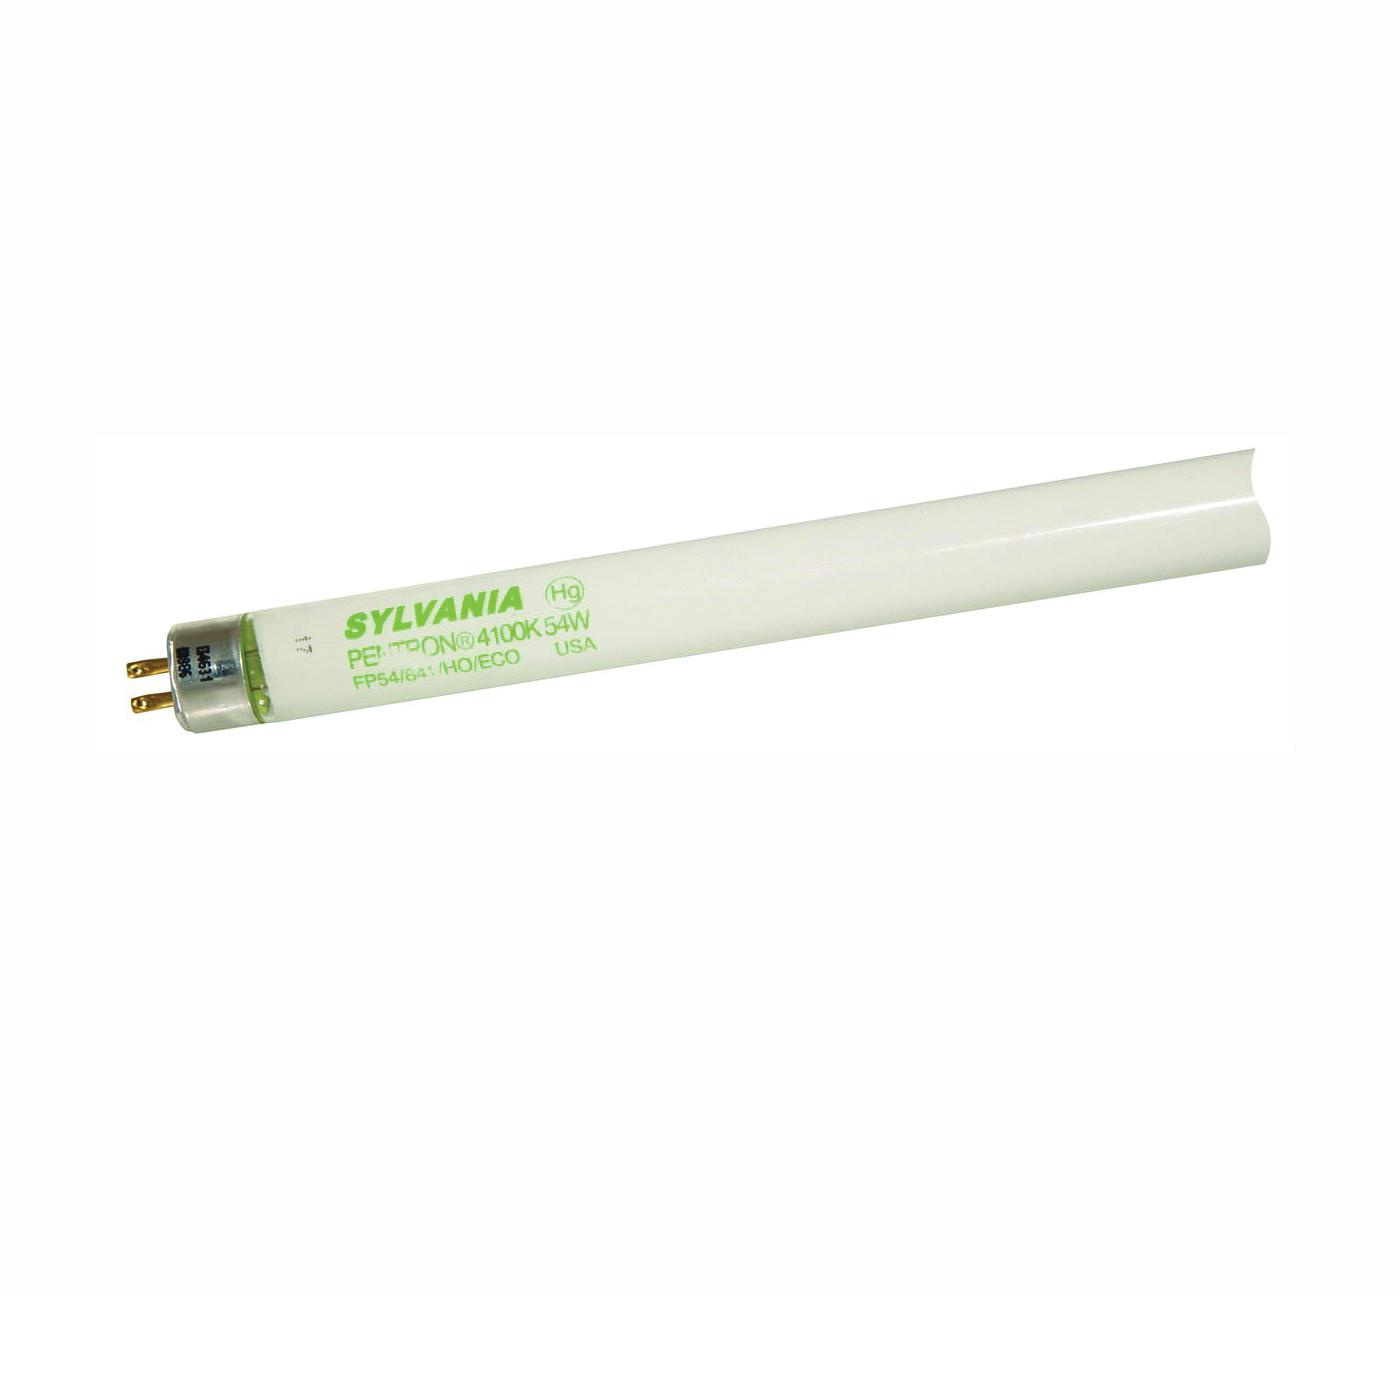 Picture of Sylvania 20906 Fluorescent Lamp, 54 W, T5 Lamp, Miniature G5 Lamp Base, 4650 Lumens, 4100 K Color Temp